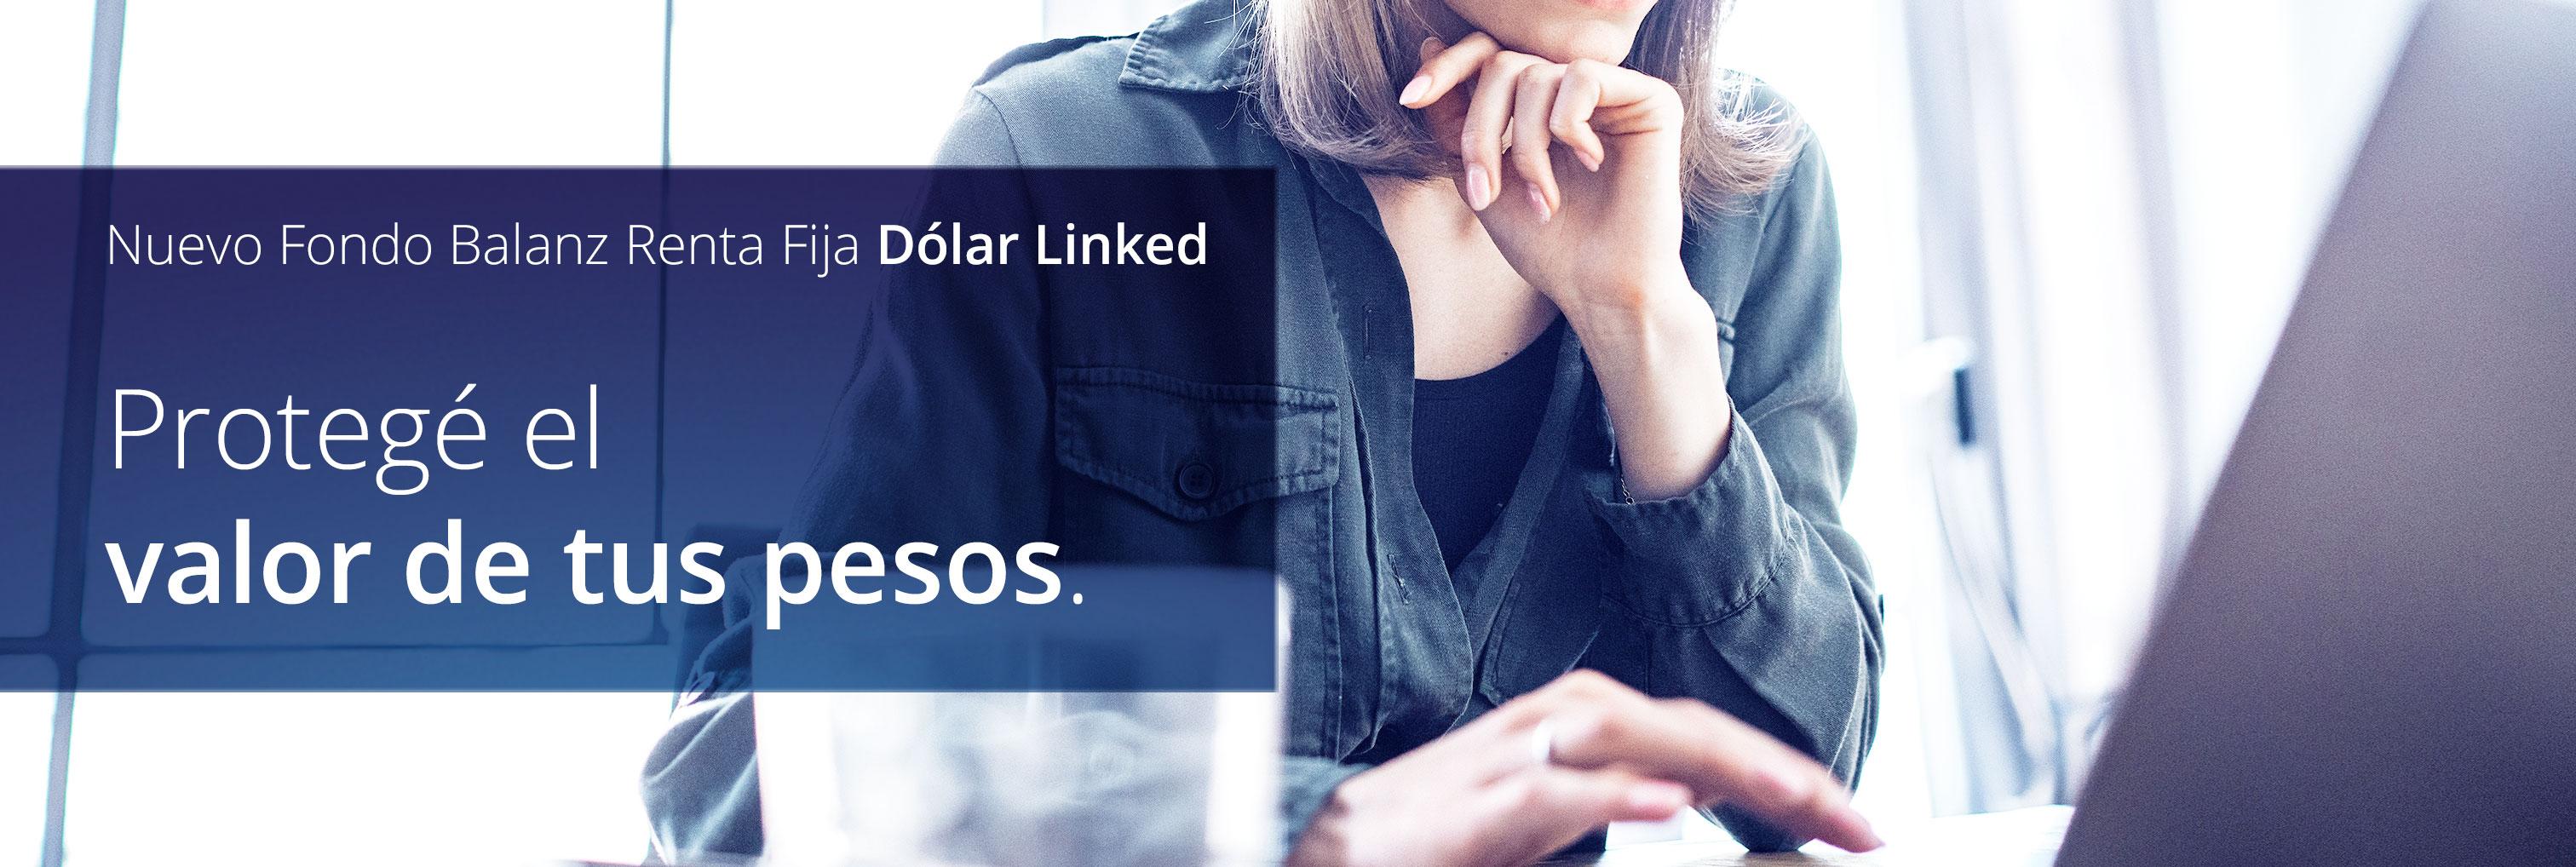 Nuevo Fondo Balanz Renta Fija Dolar Linked